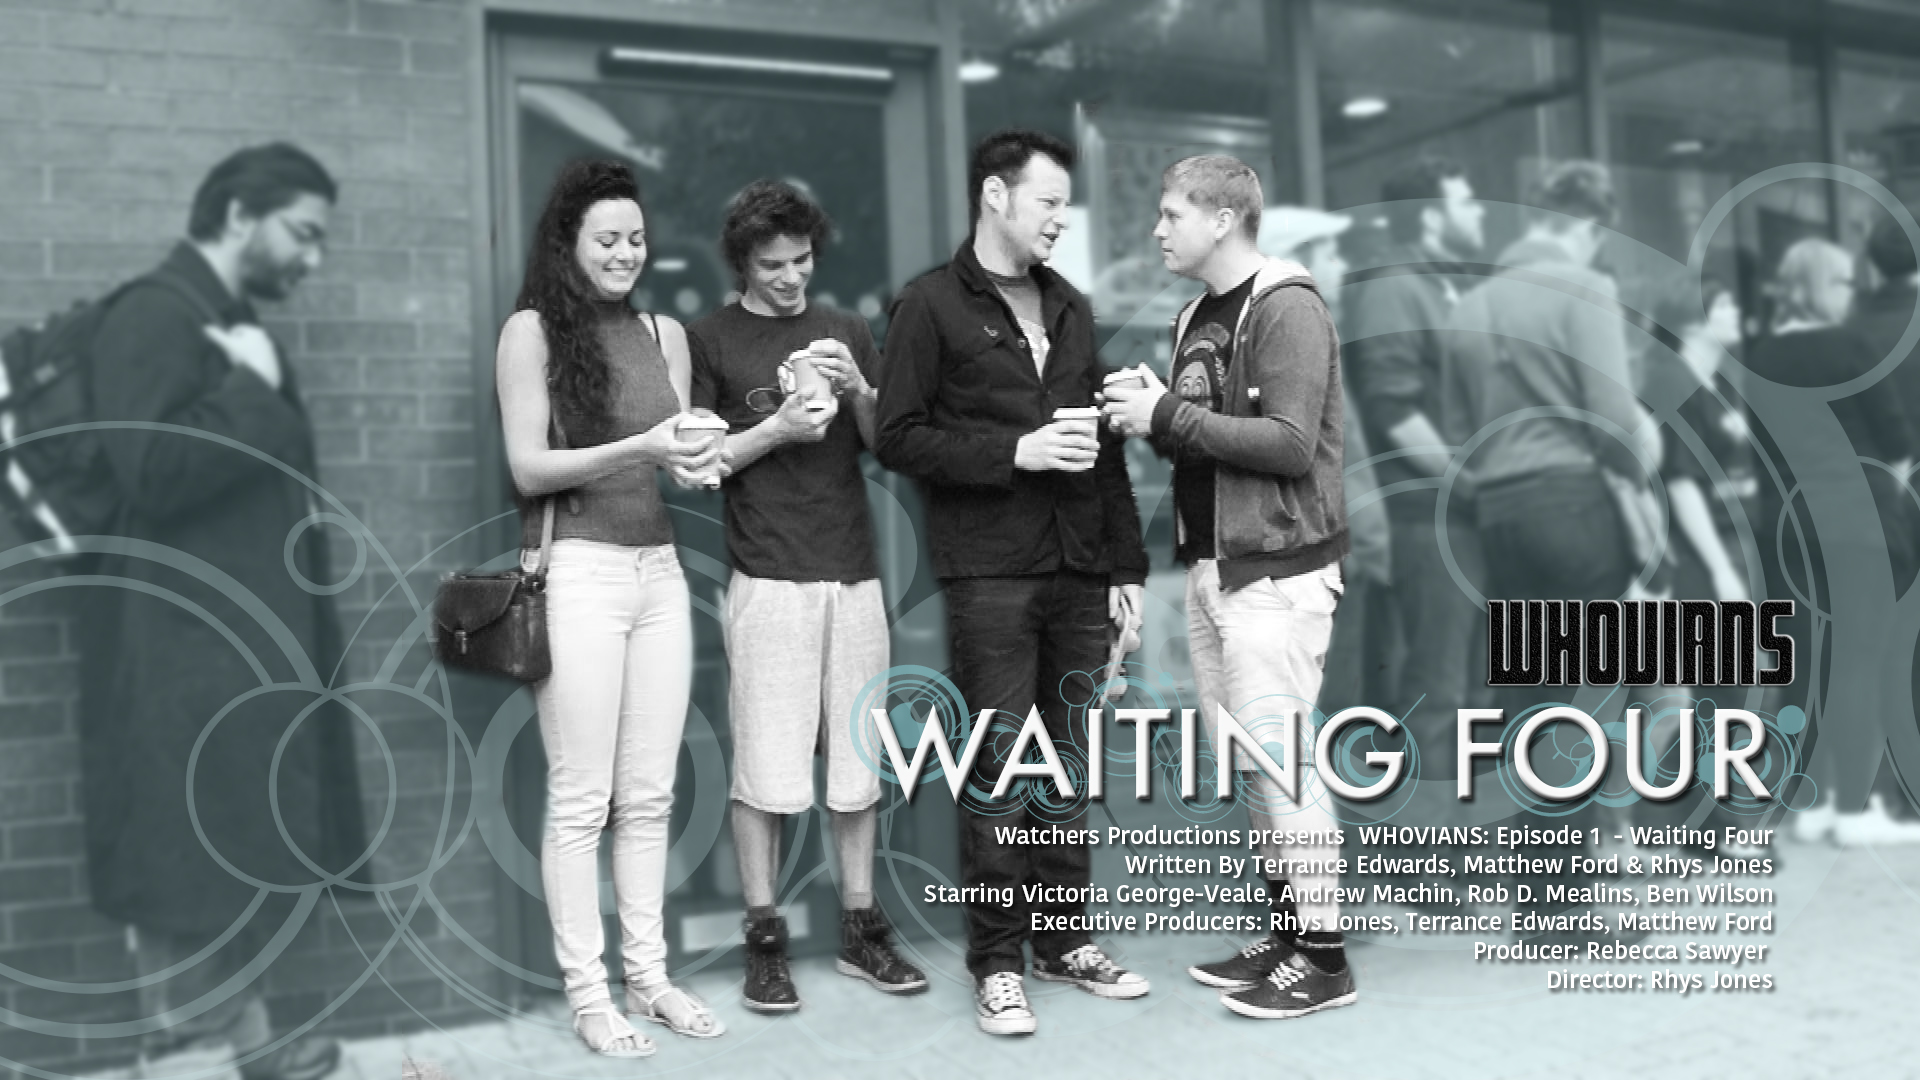 Episode 1 - Waiting Four